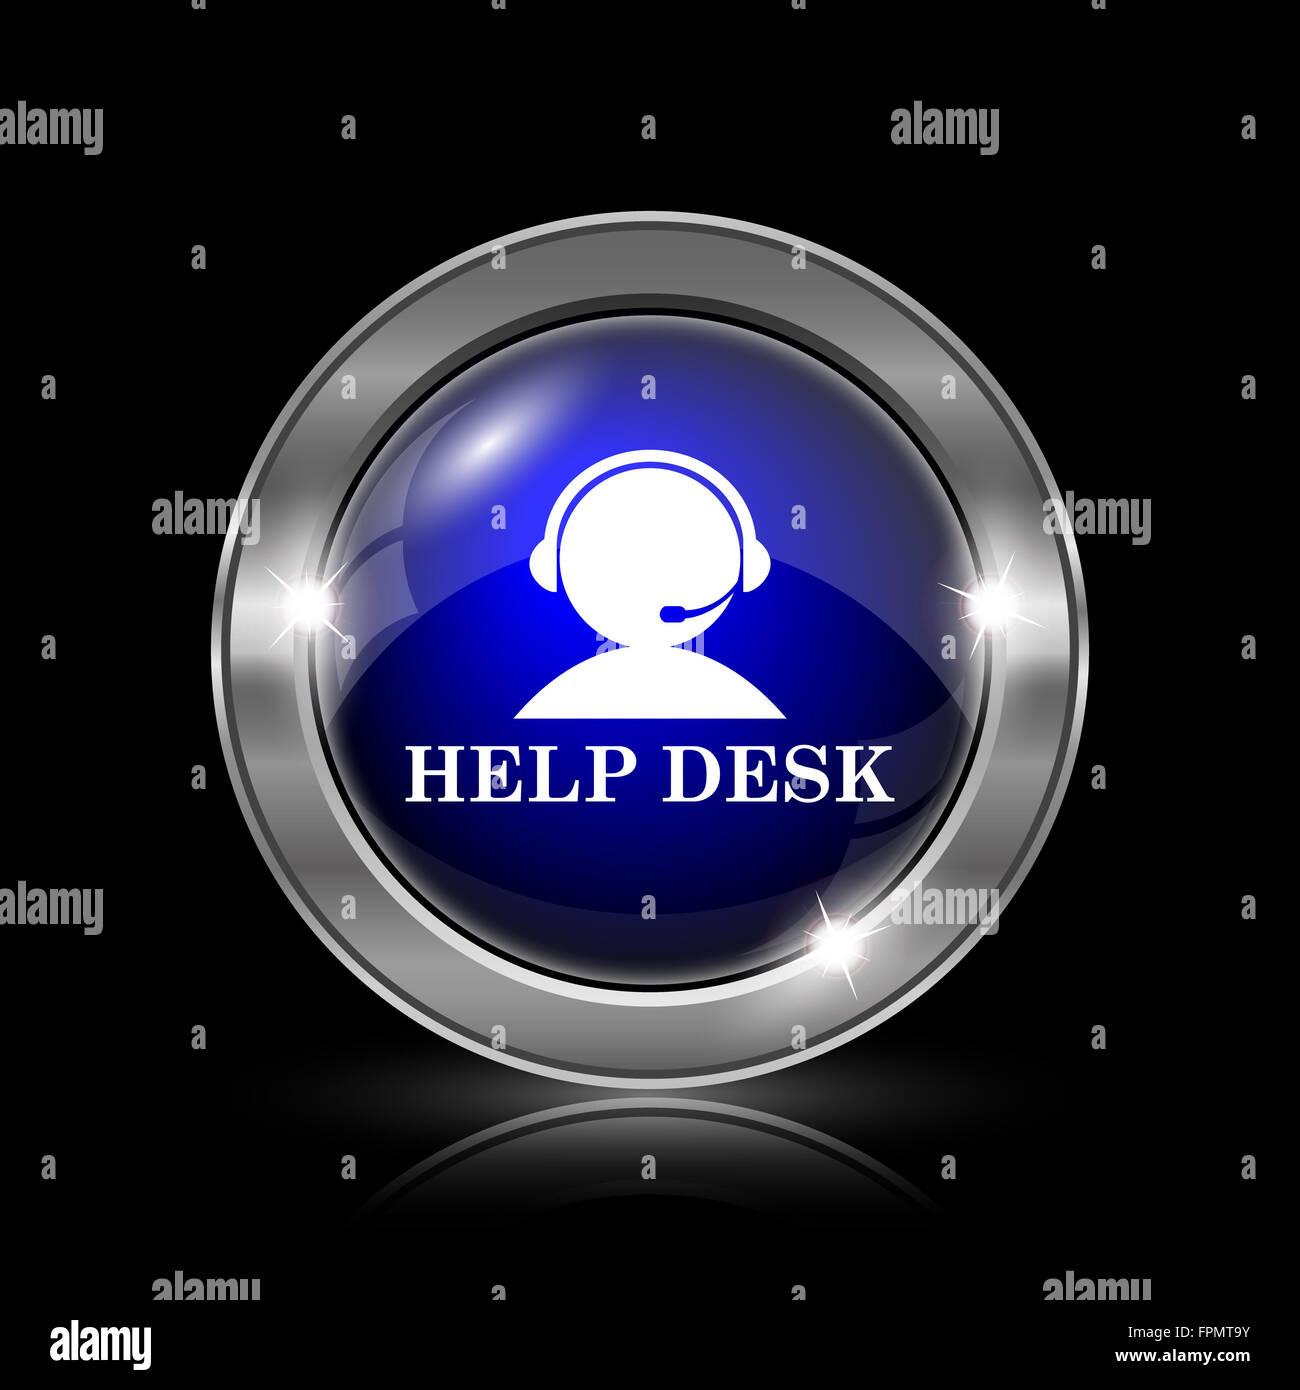 Helpdesk Icon. Metallic Internet Button On Black Background.